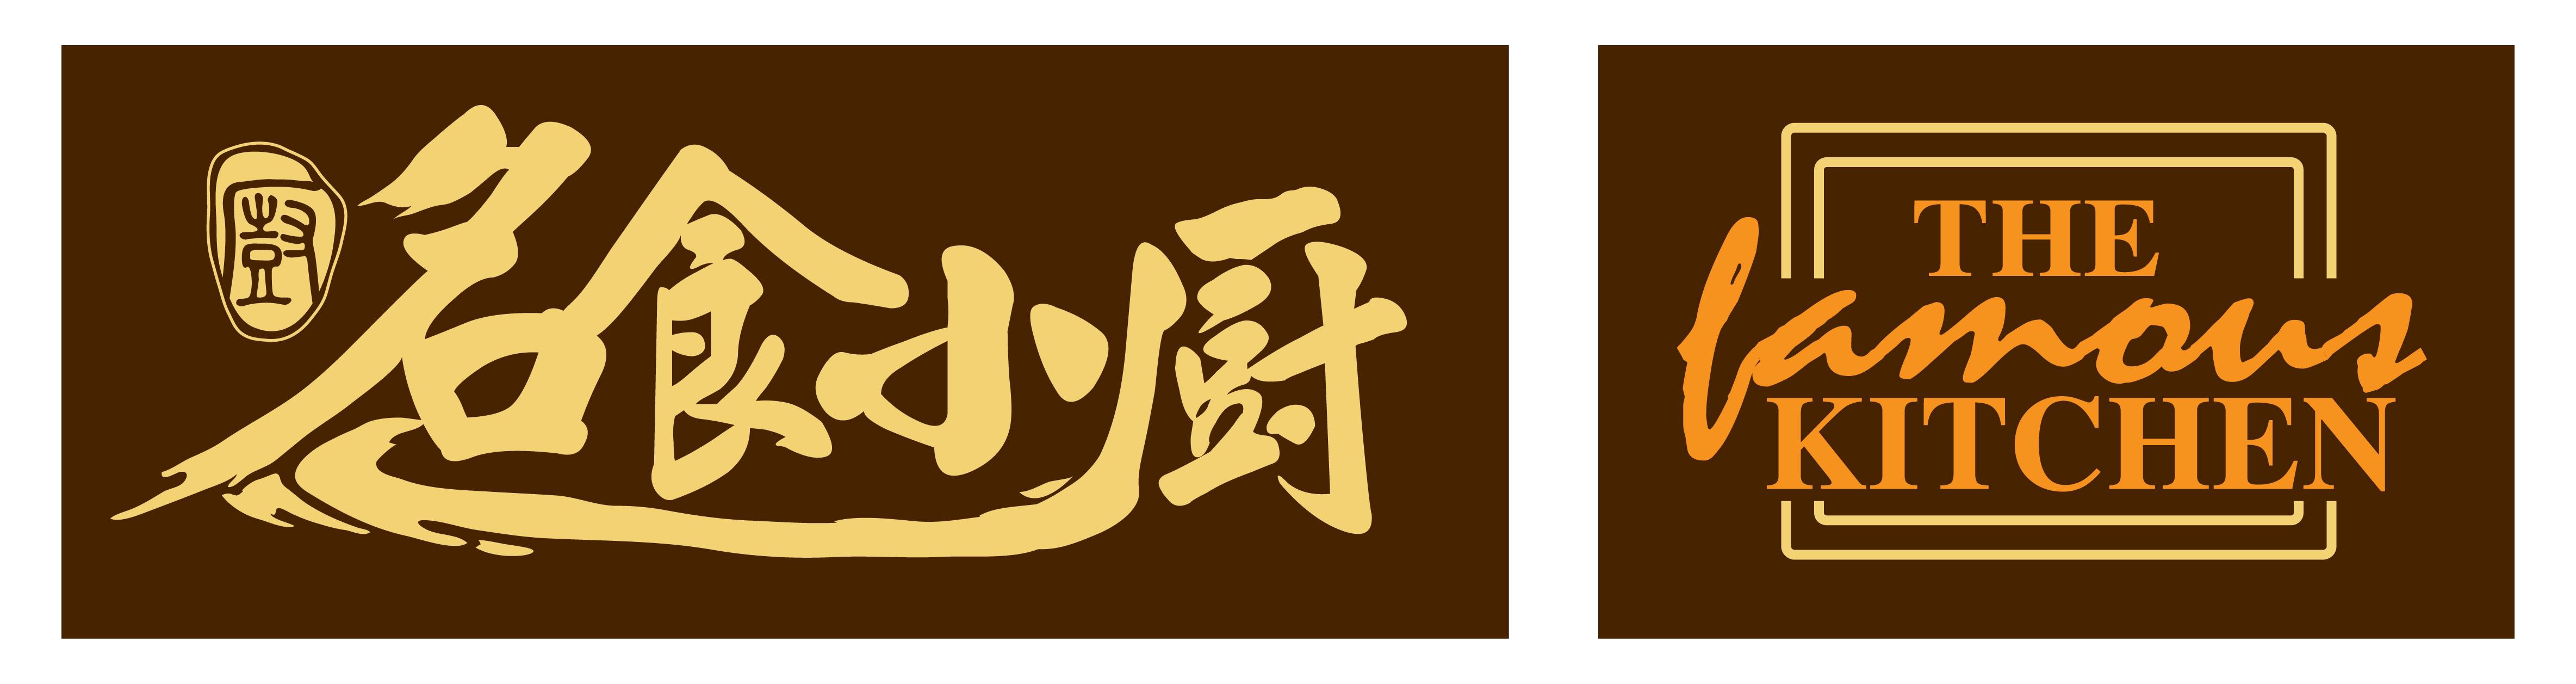 Famous Kitchen Logo (3) (7)